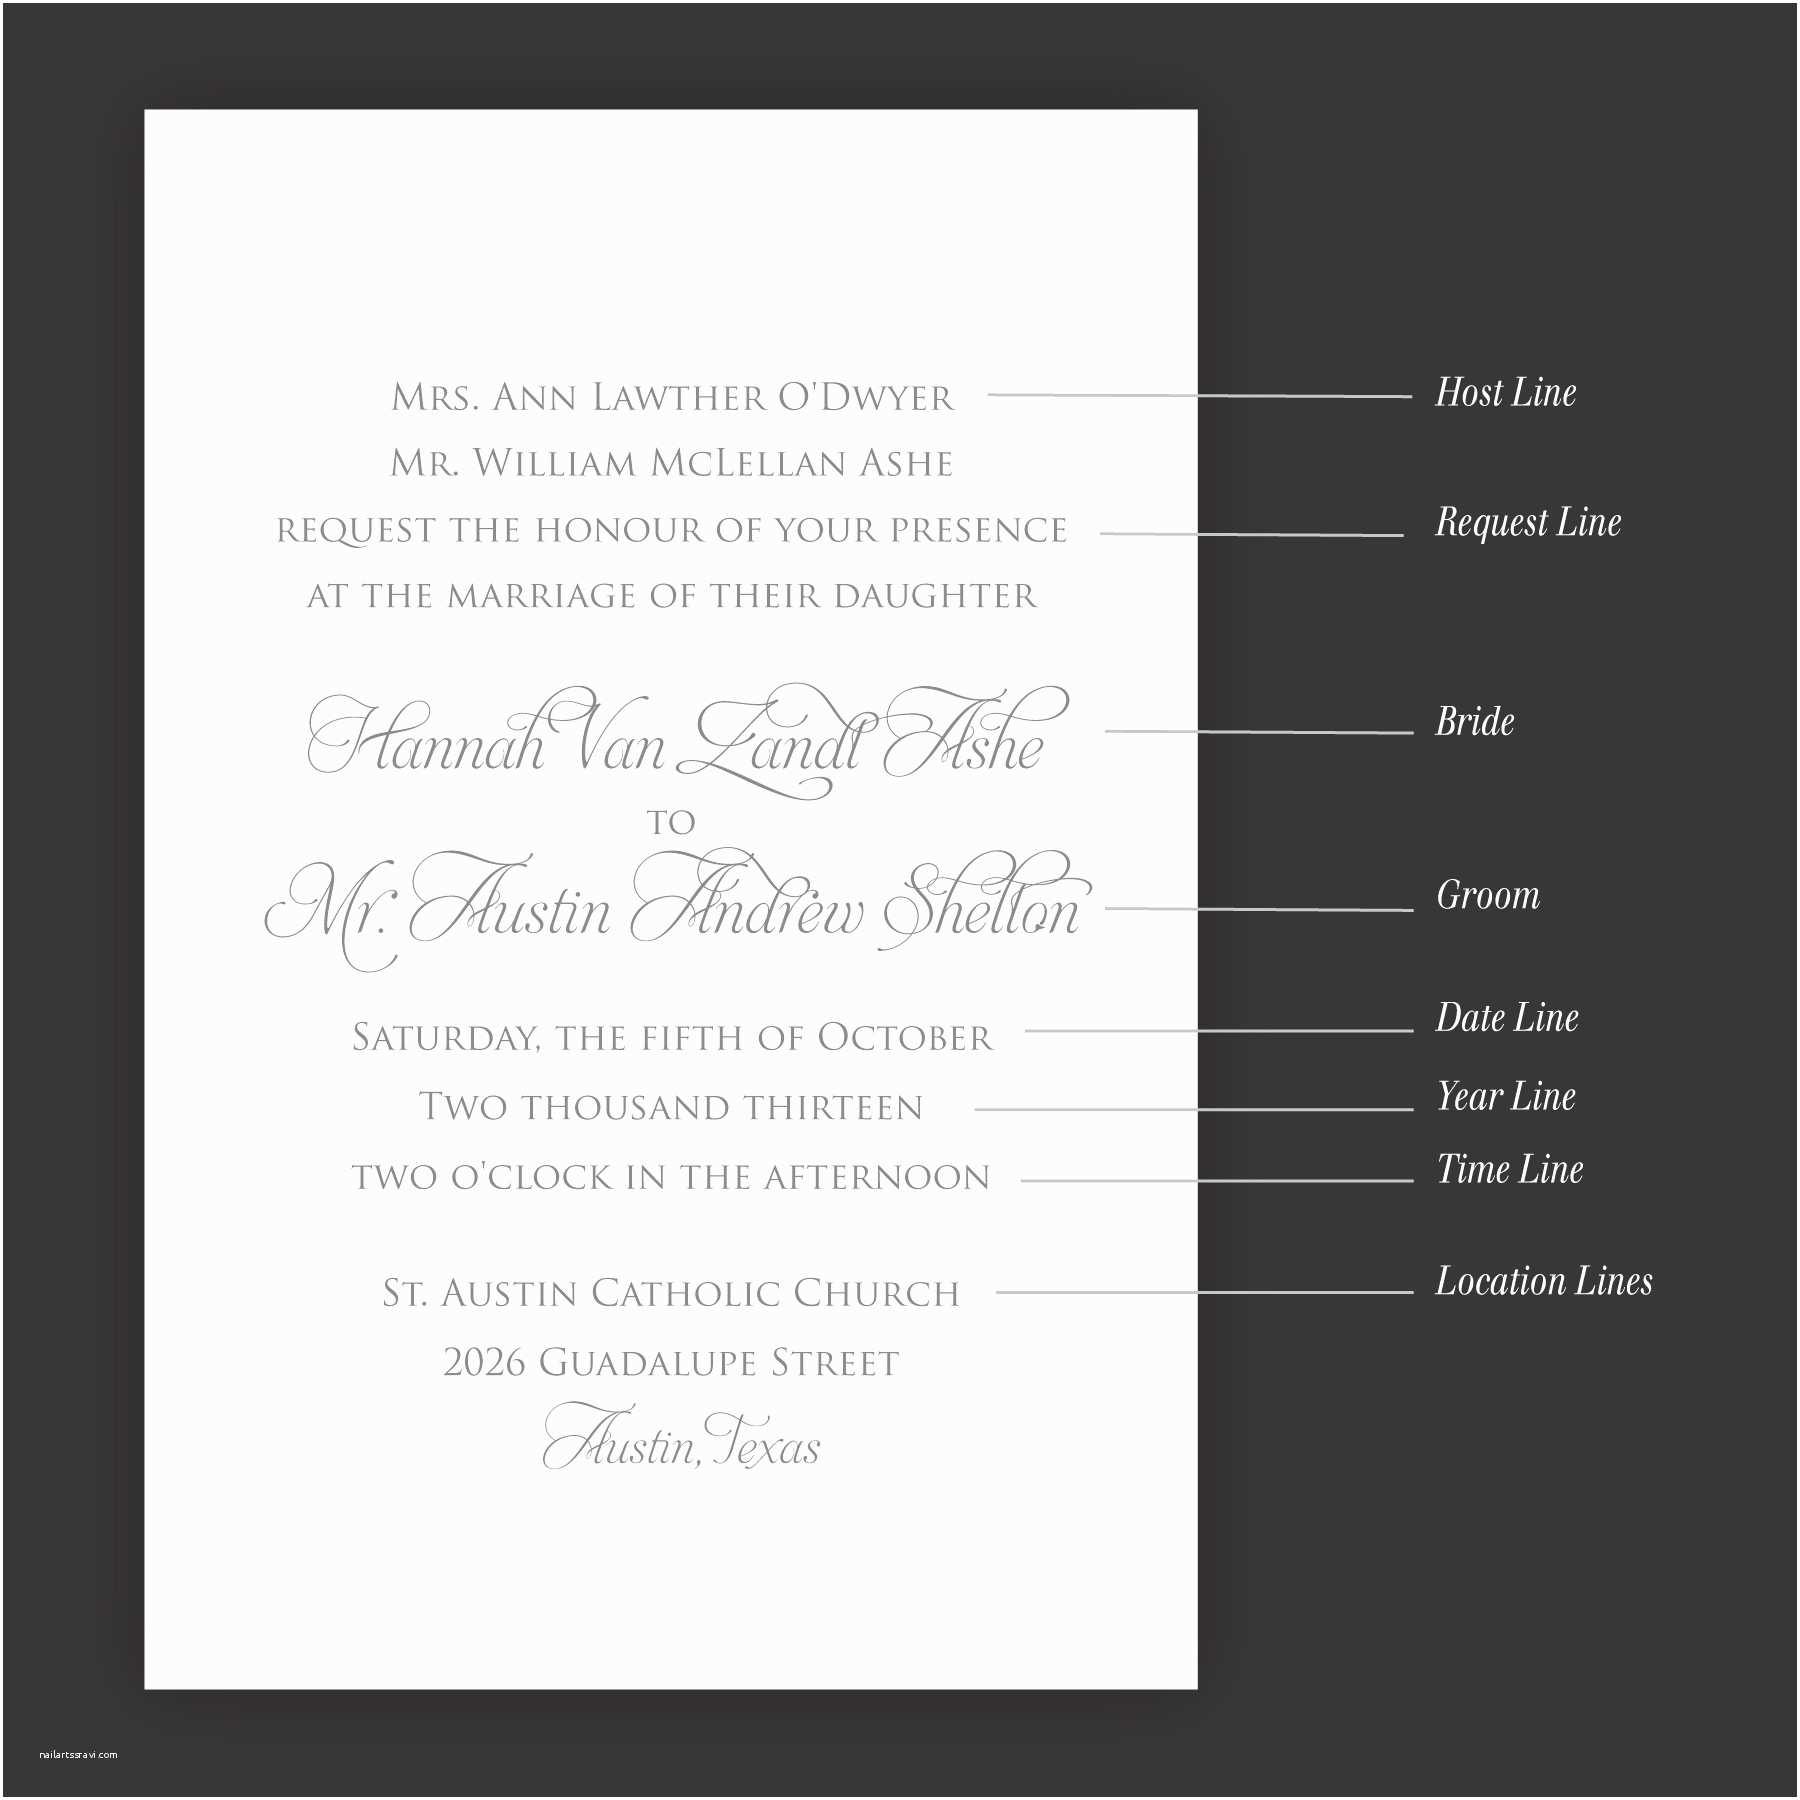 Military Wedding Invitation Wording Samples Invitation Wording